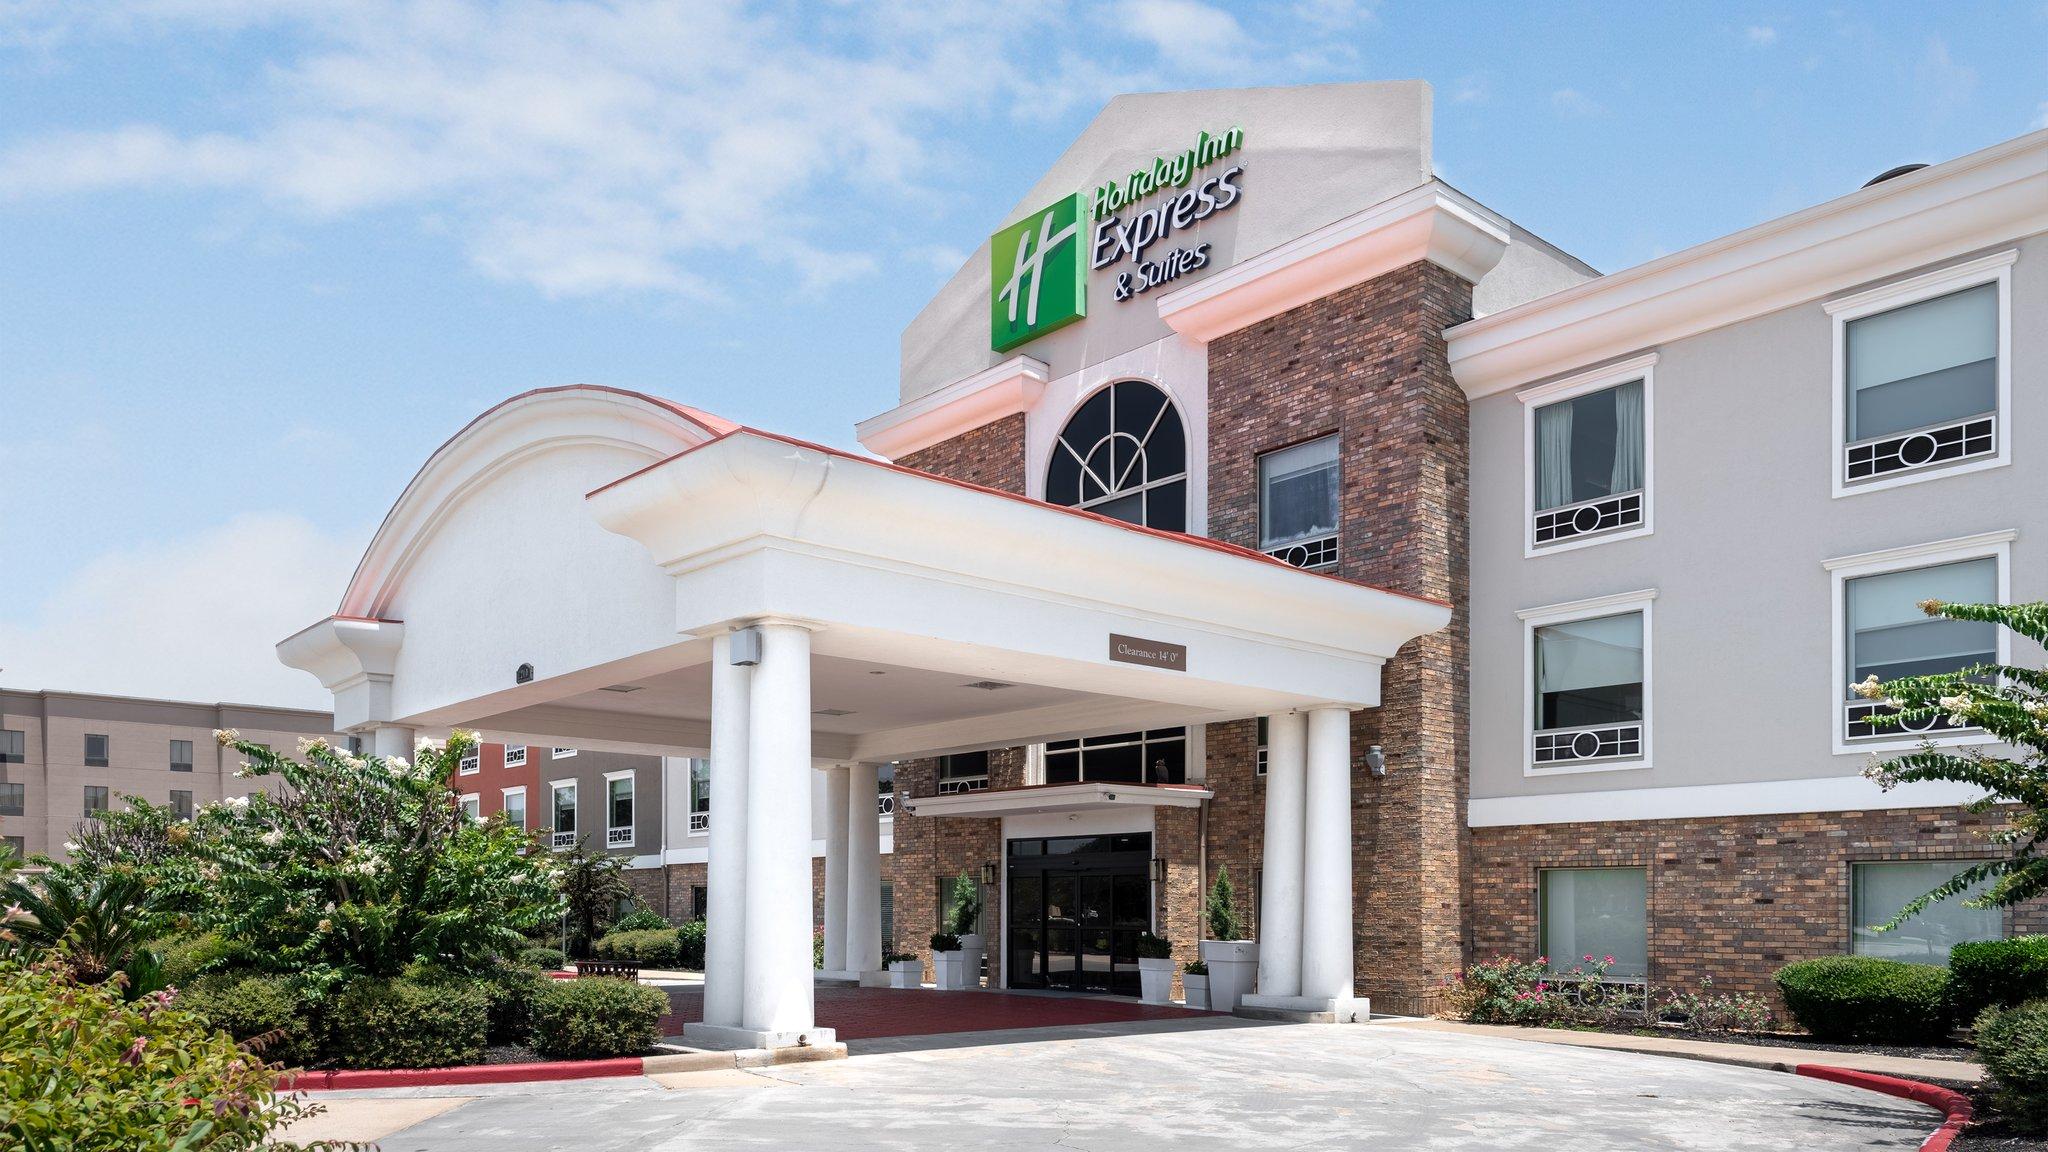 Holiday Inn Exp Stes Conroe